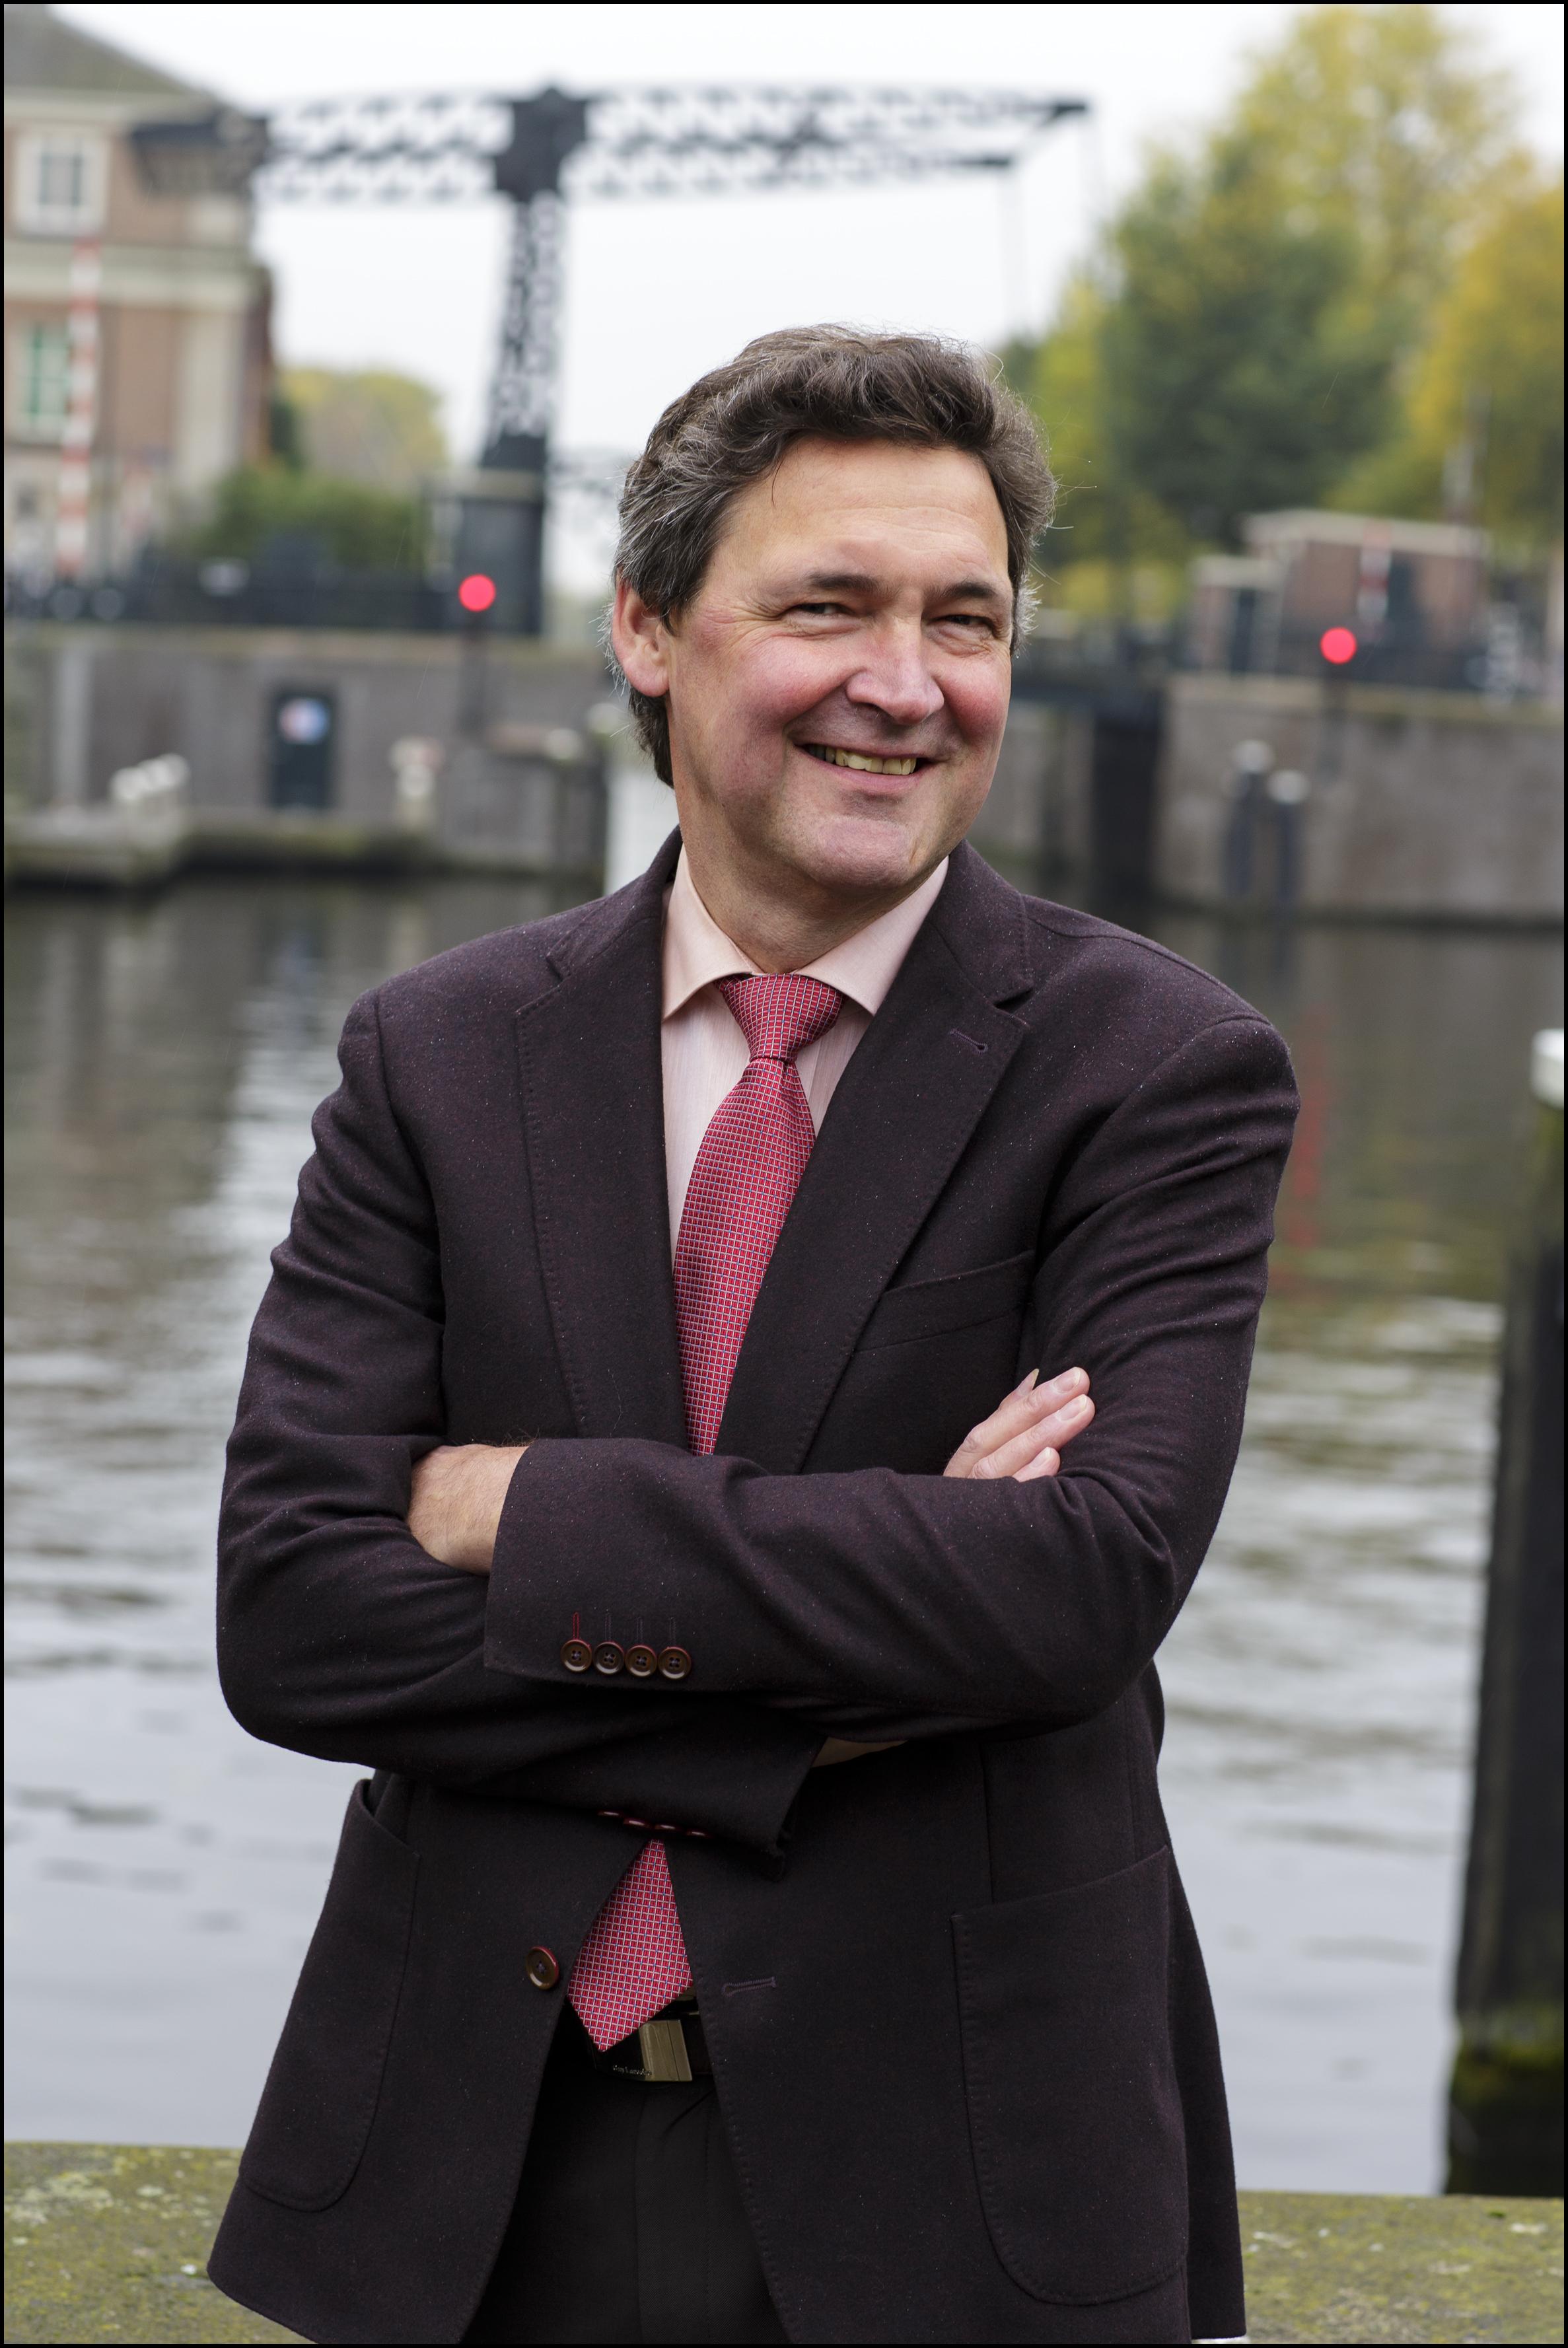 Ton Nijhuis (Cobyright: Rebke Klokke)